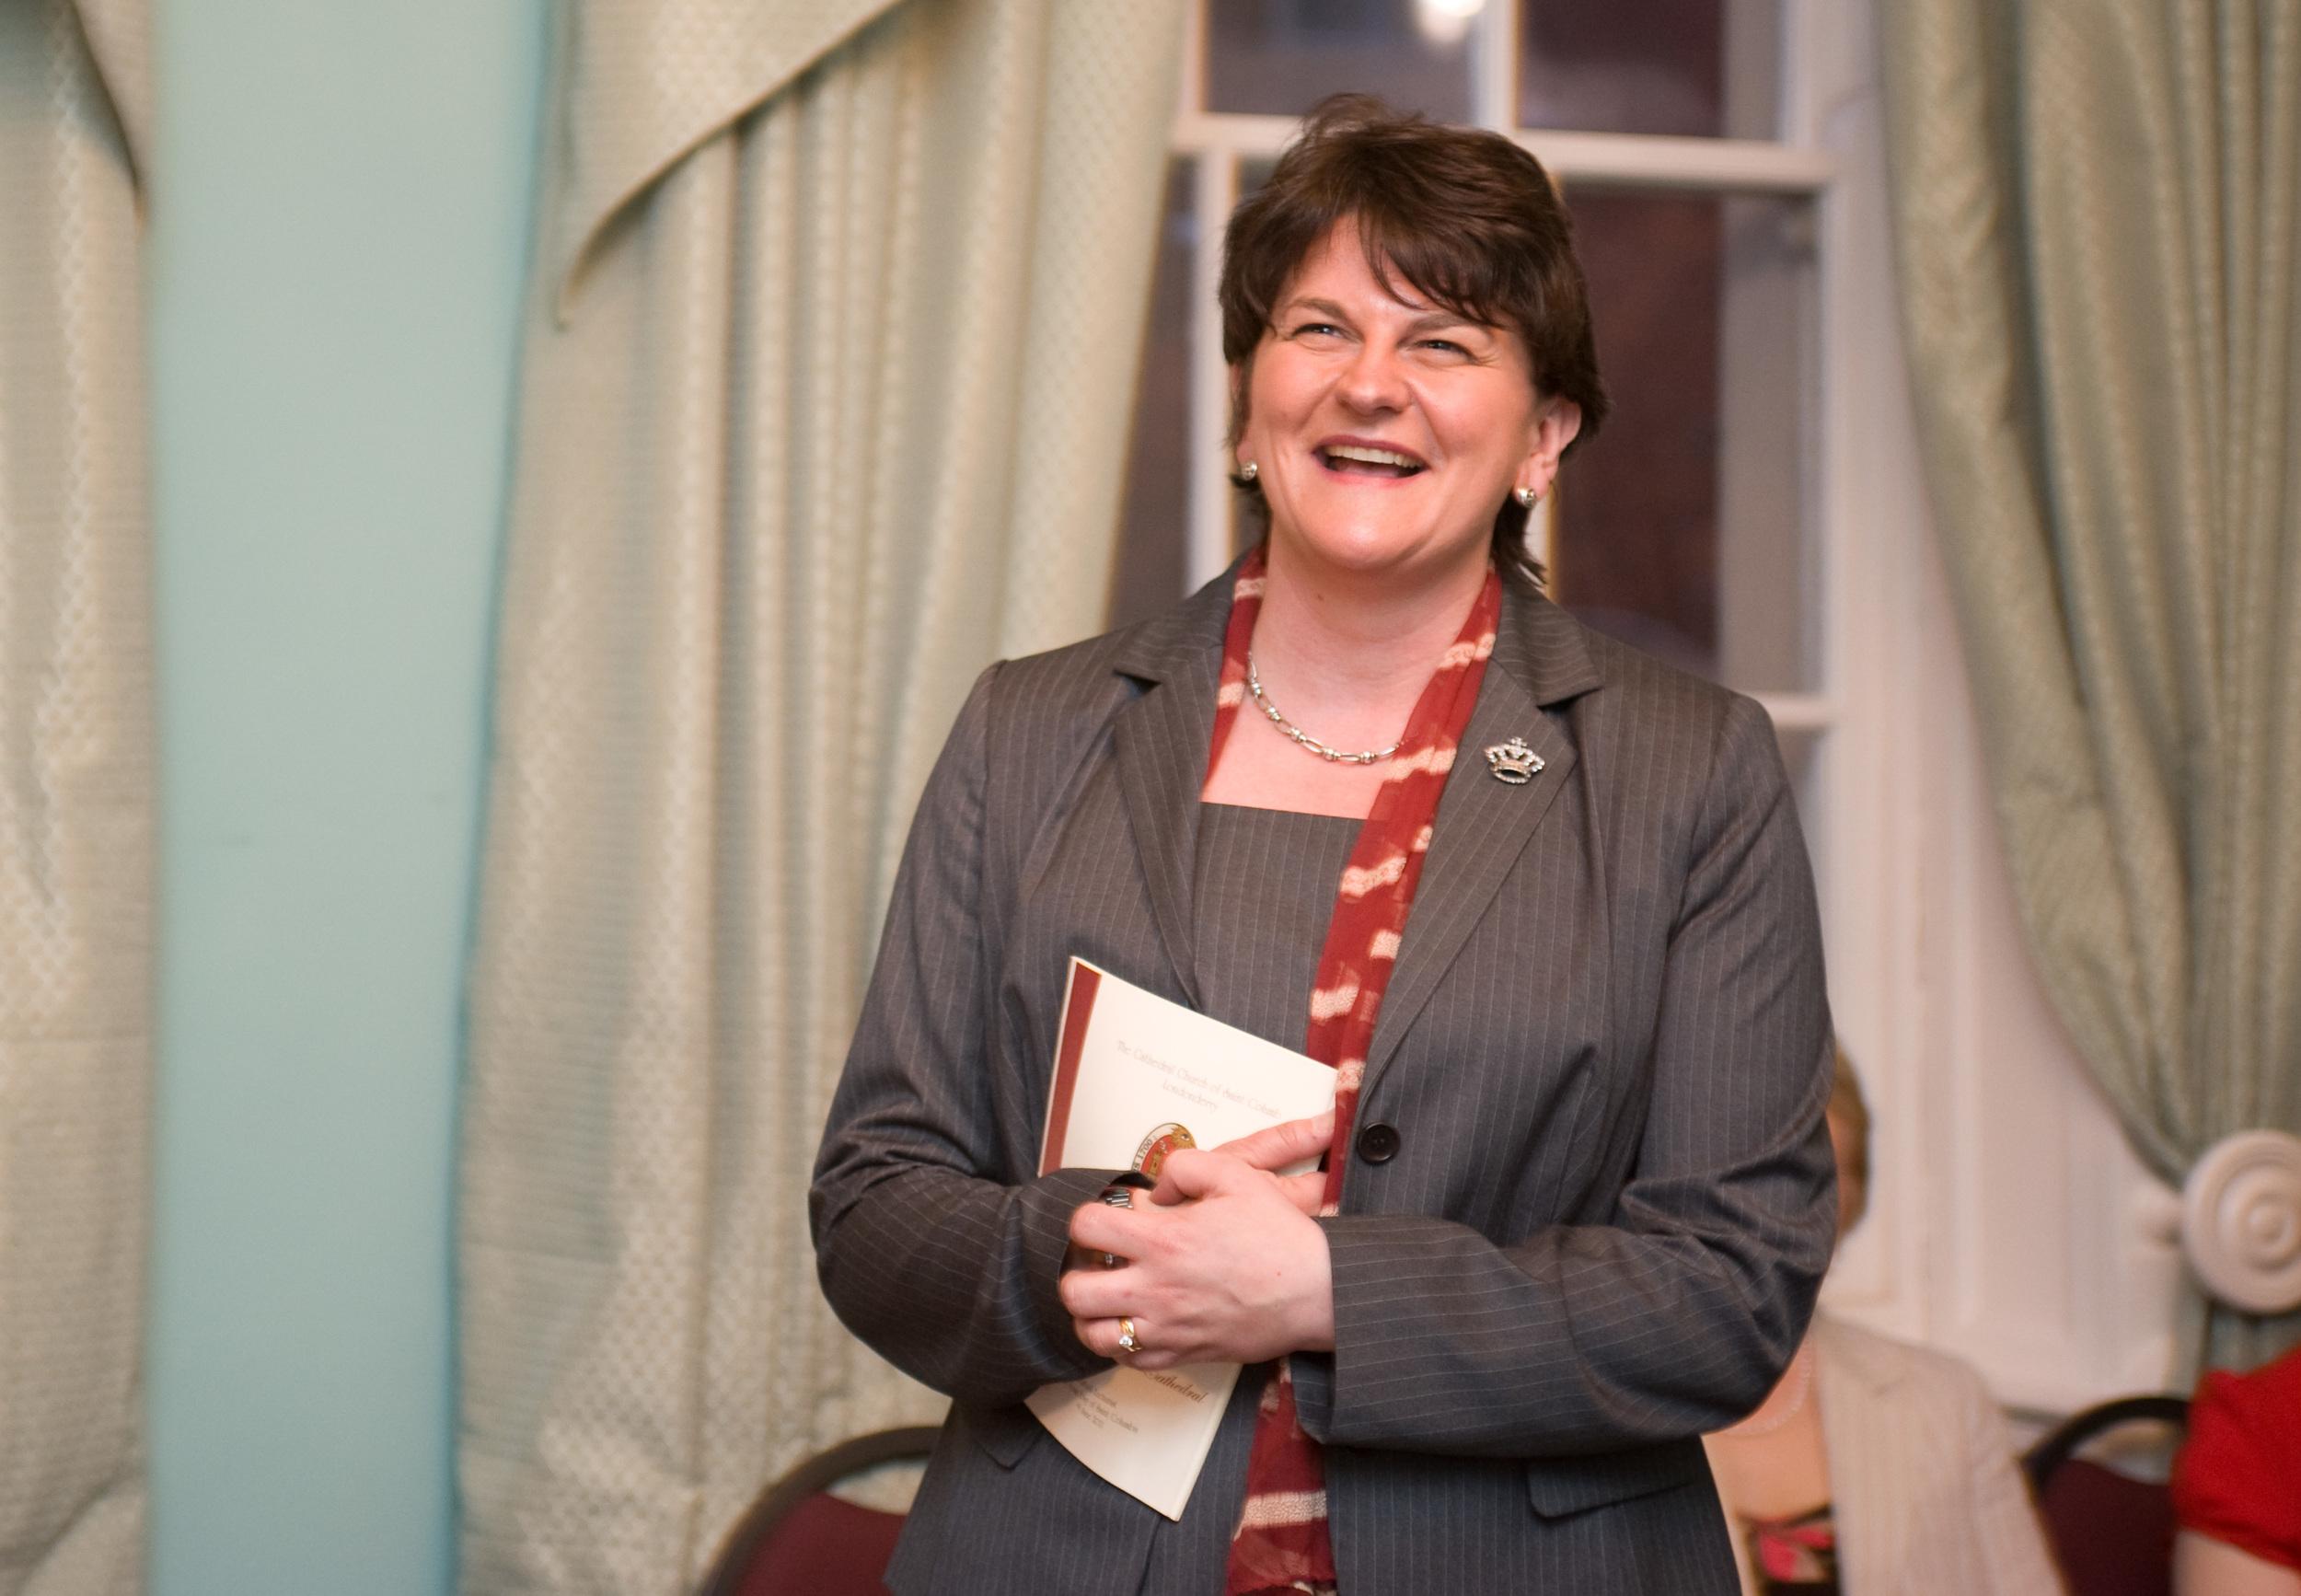 Minister Arlene Foster attends St Columb's Dedication - following multi million refurbishment